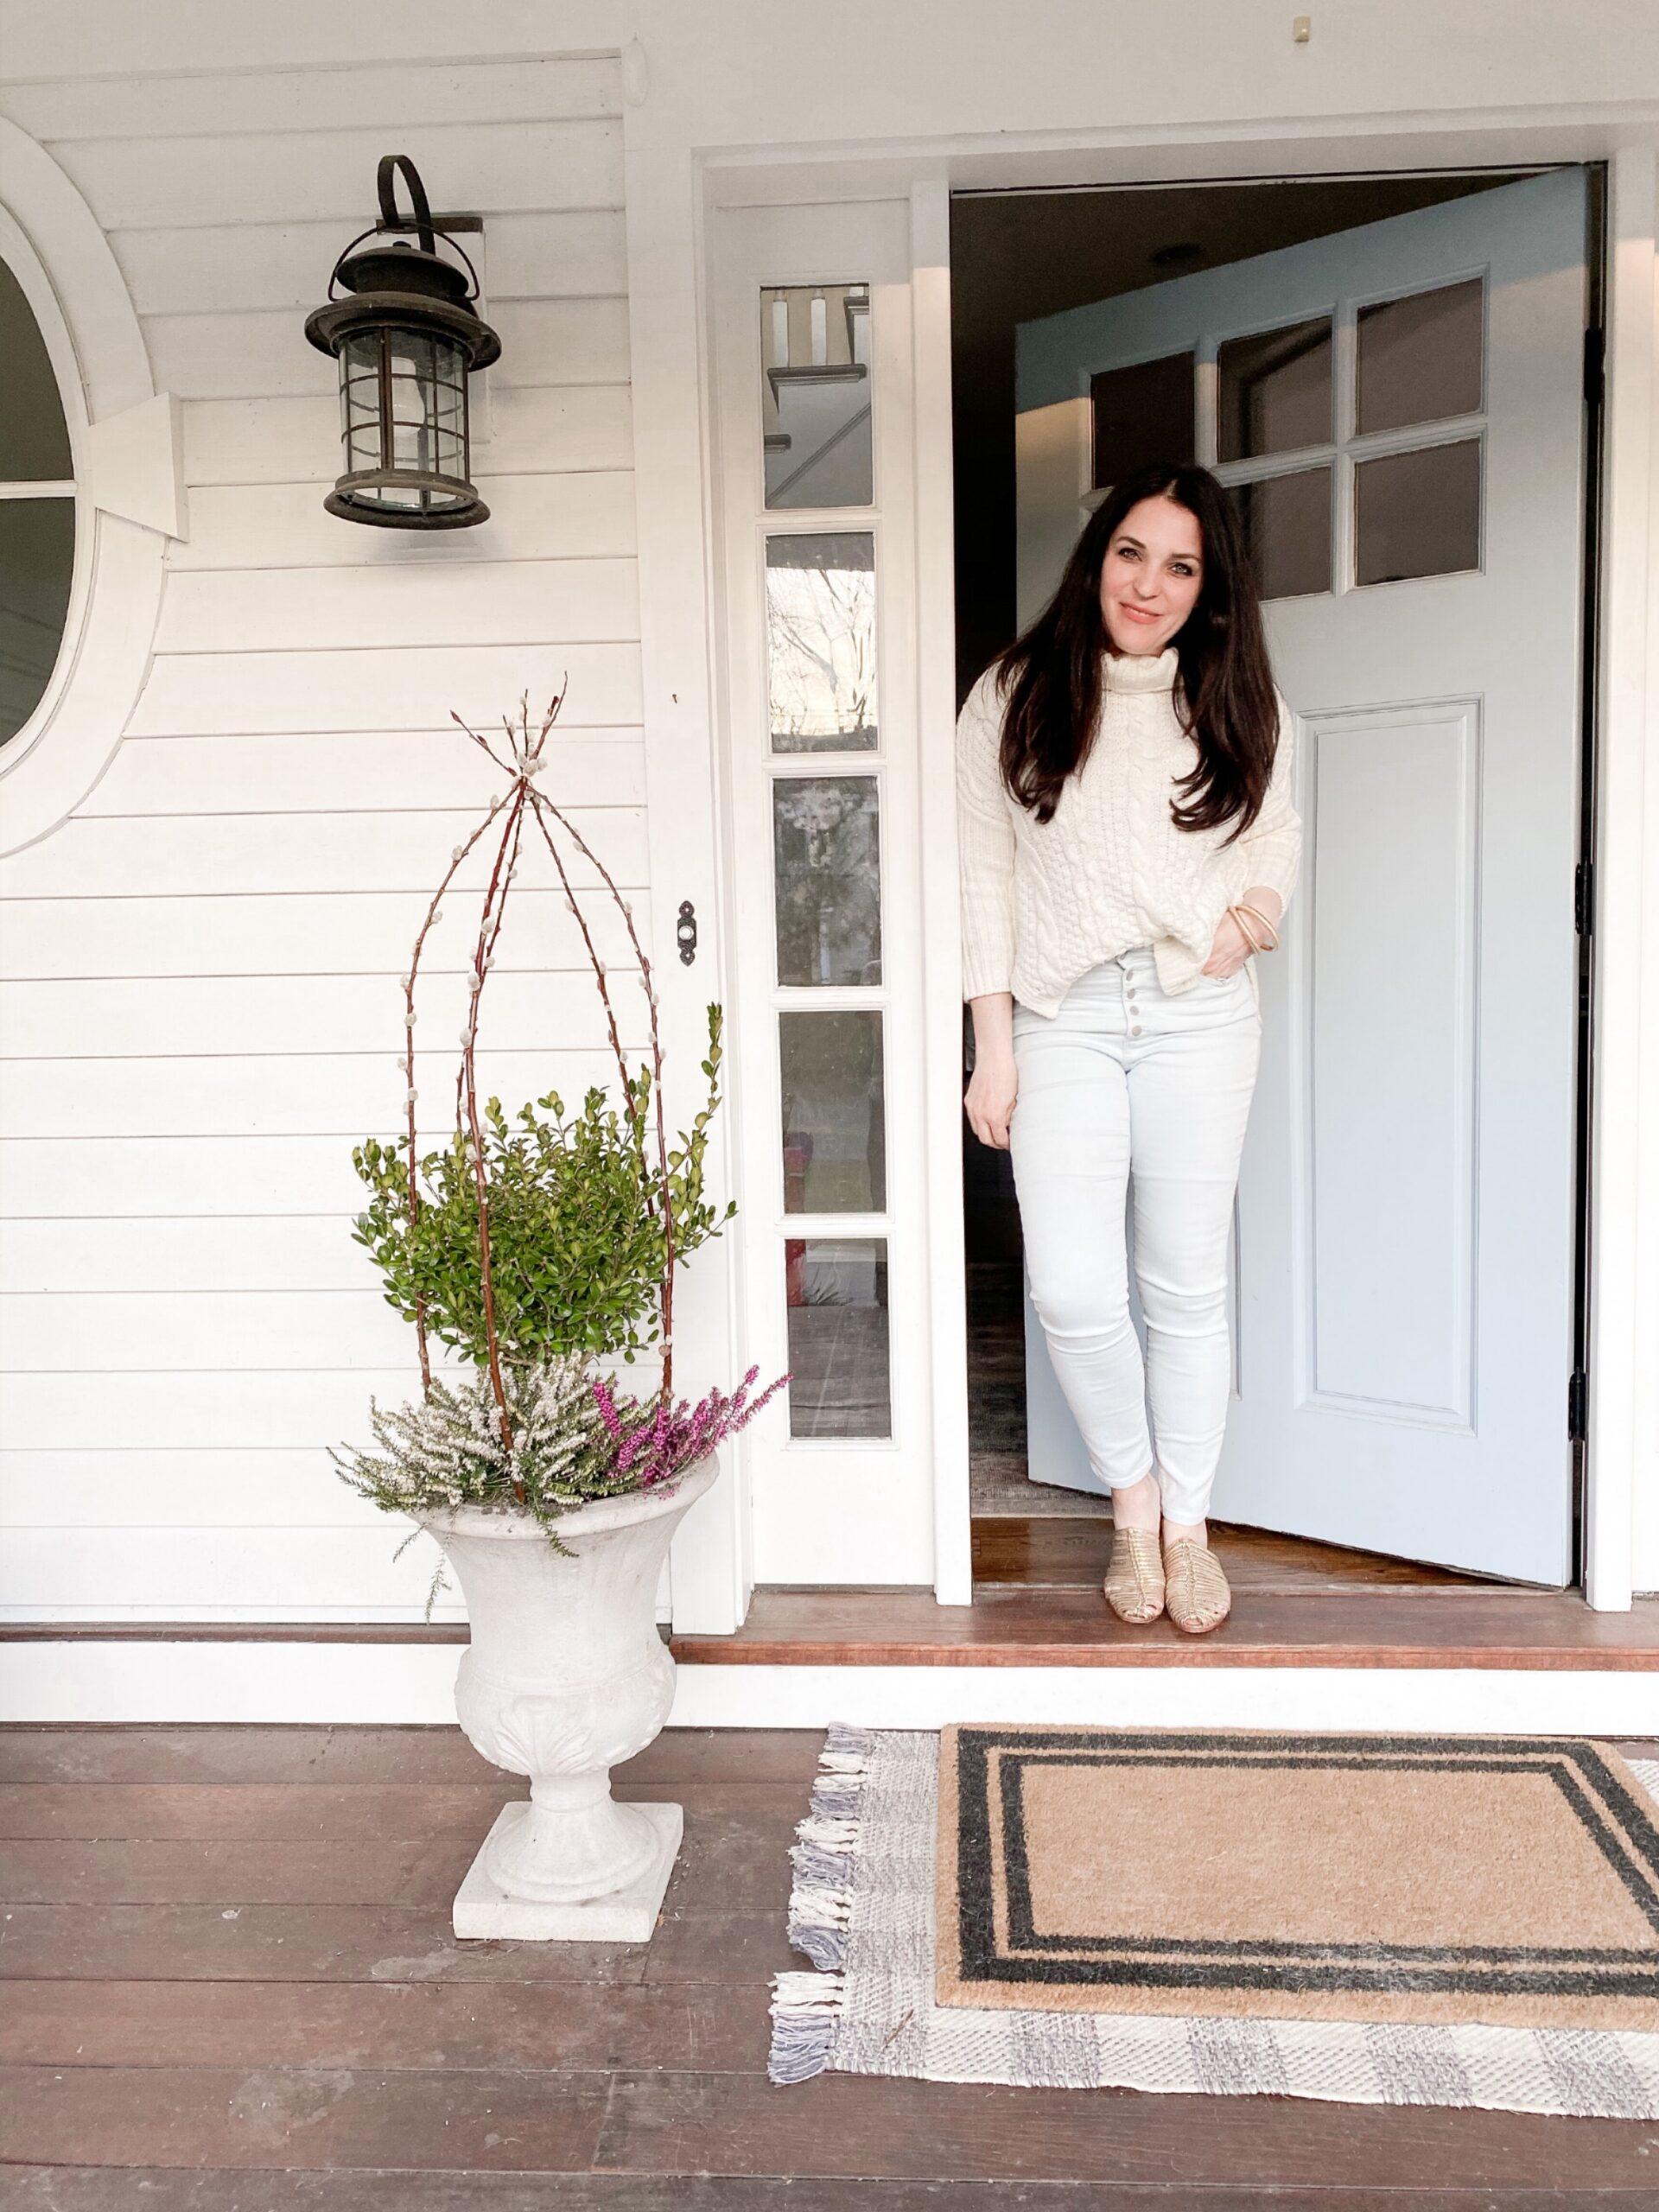 Simple Spring Planter to Last through Summer    Darling Darleen Top Lifestyle CT Blogger #springplanter